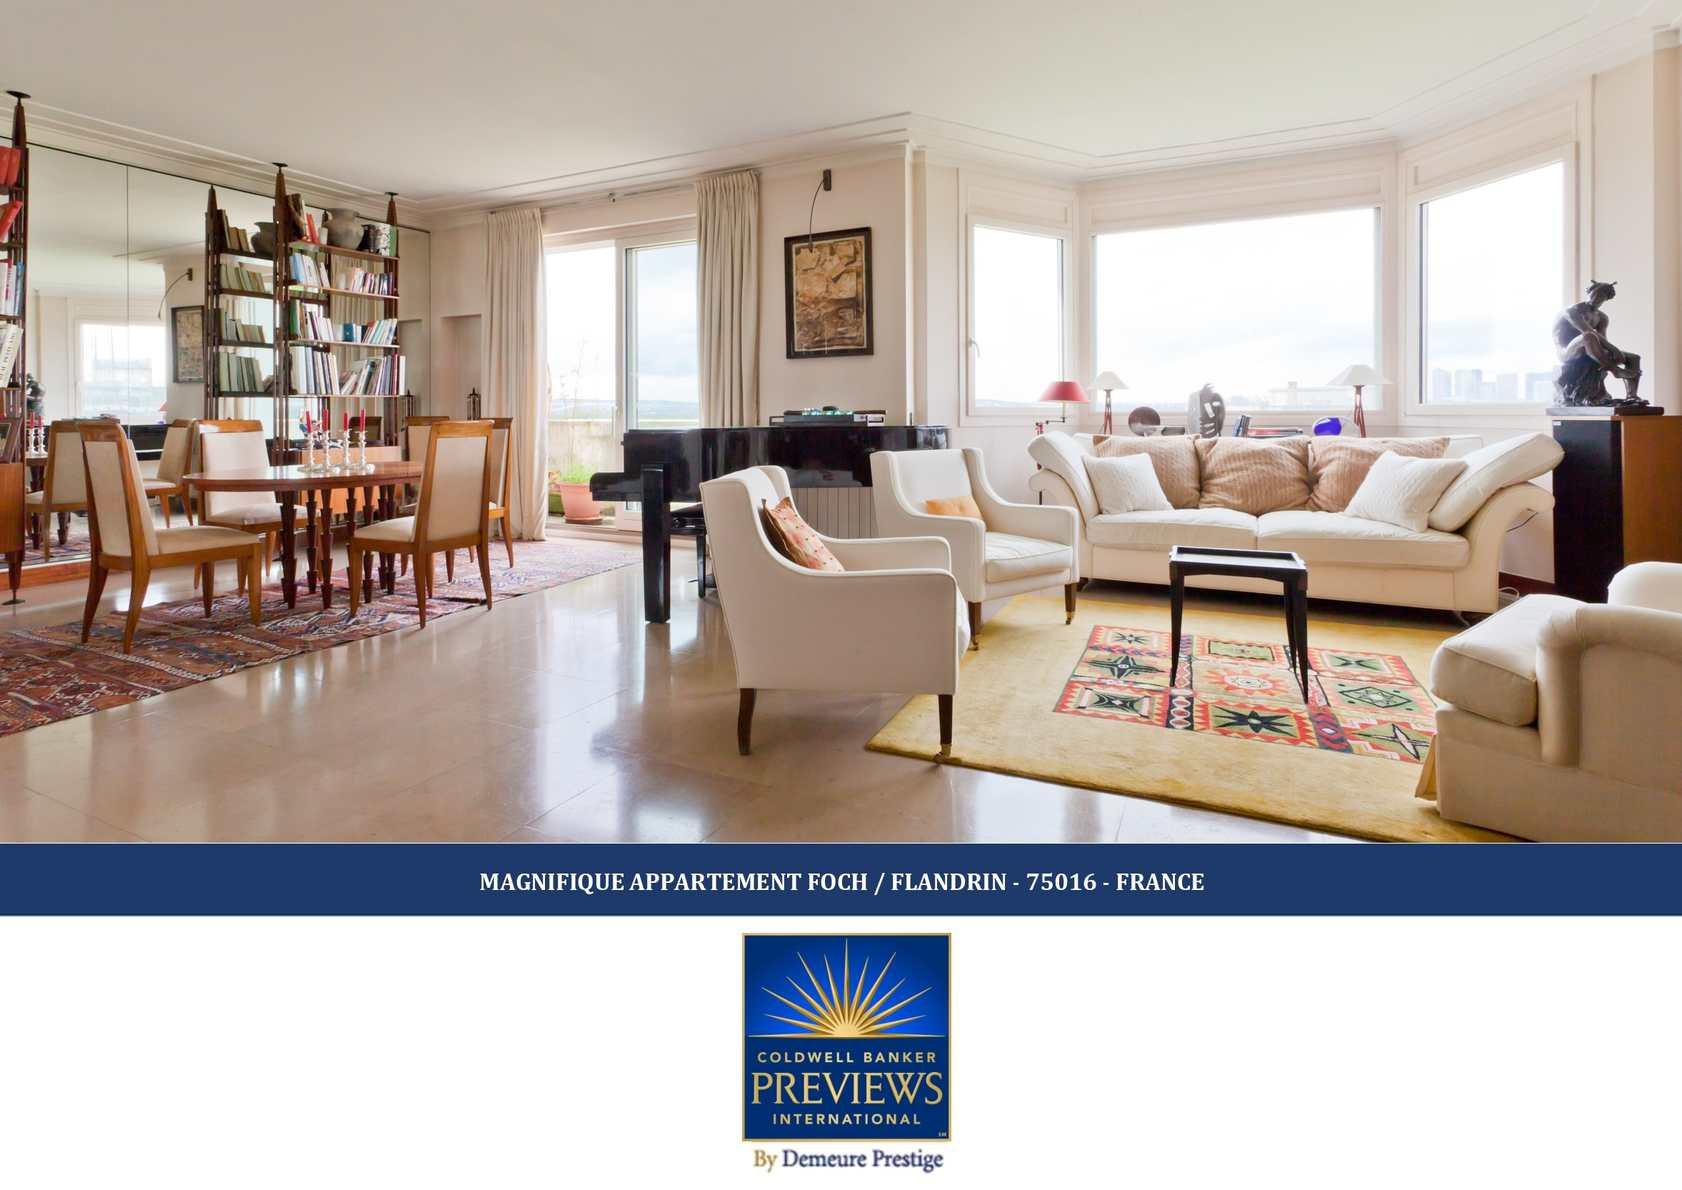 calam o collection coldwell banker previews international magnifique appartement foch. Black Bedroom Furniture Sets. Home Design Ideas